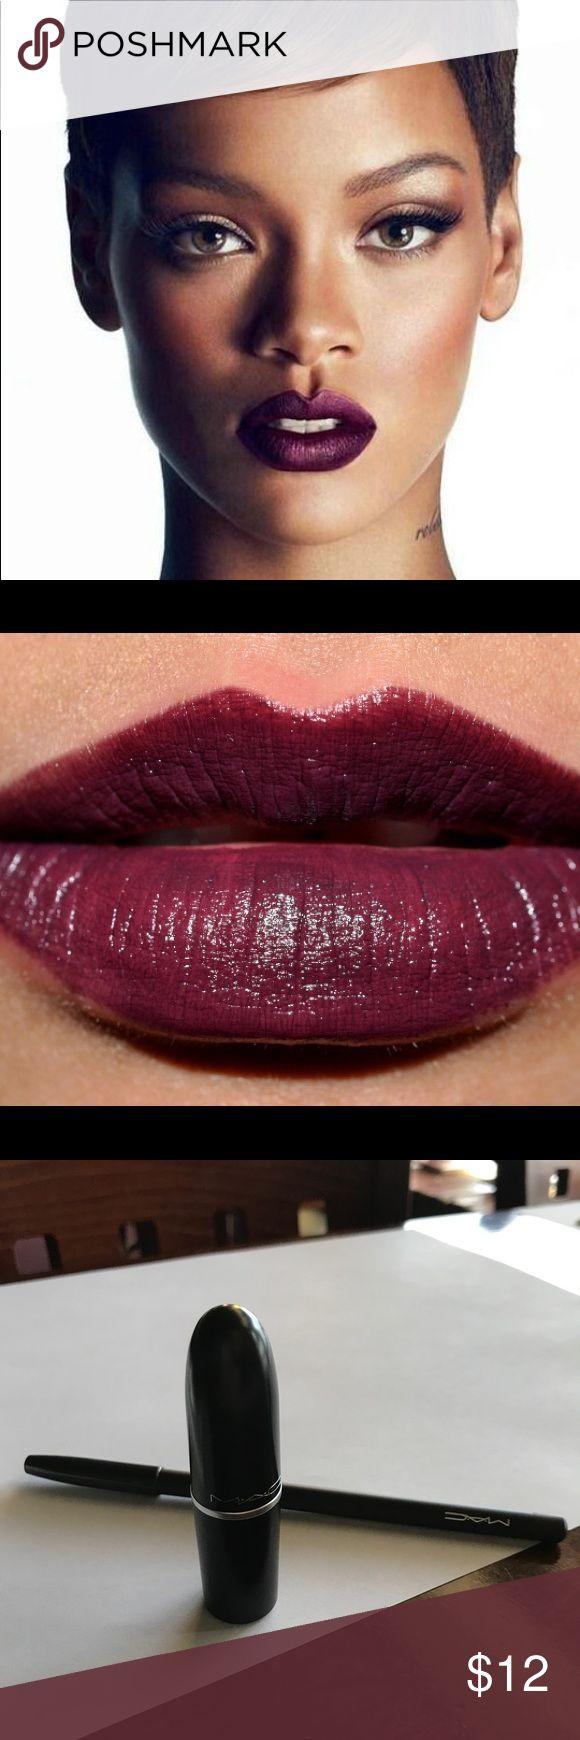 Mac cyber lipstick Brand new item Color: cyber- Intense blackish purple MAC Cosmetics Makeup Lipstick